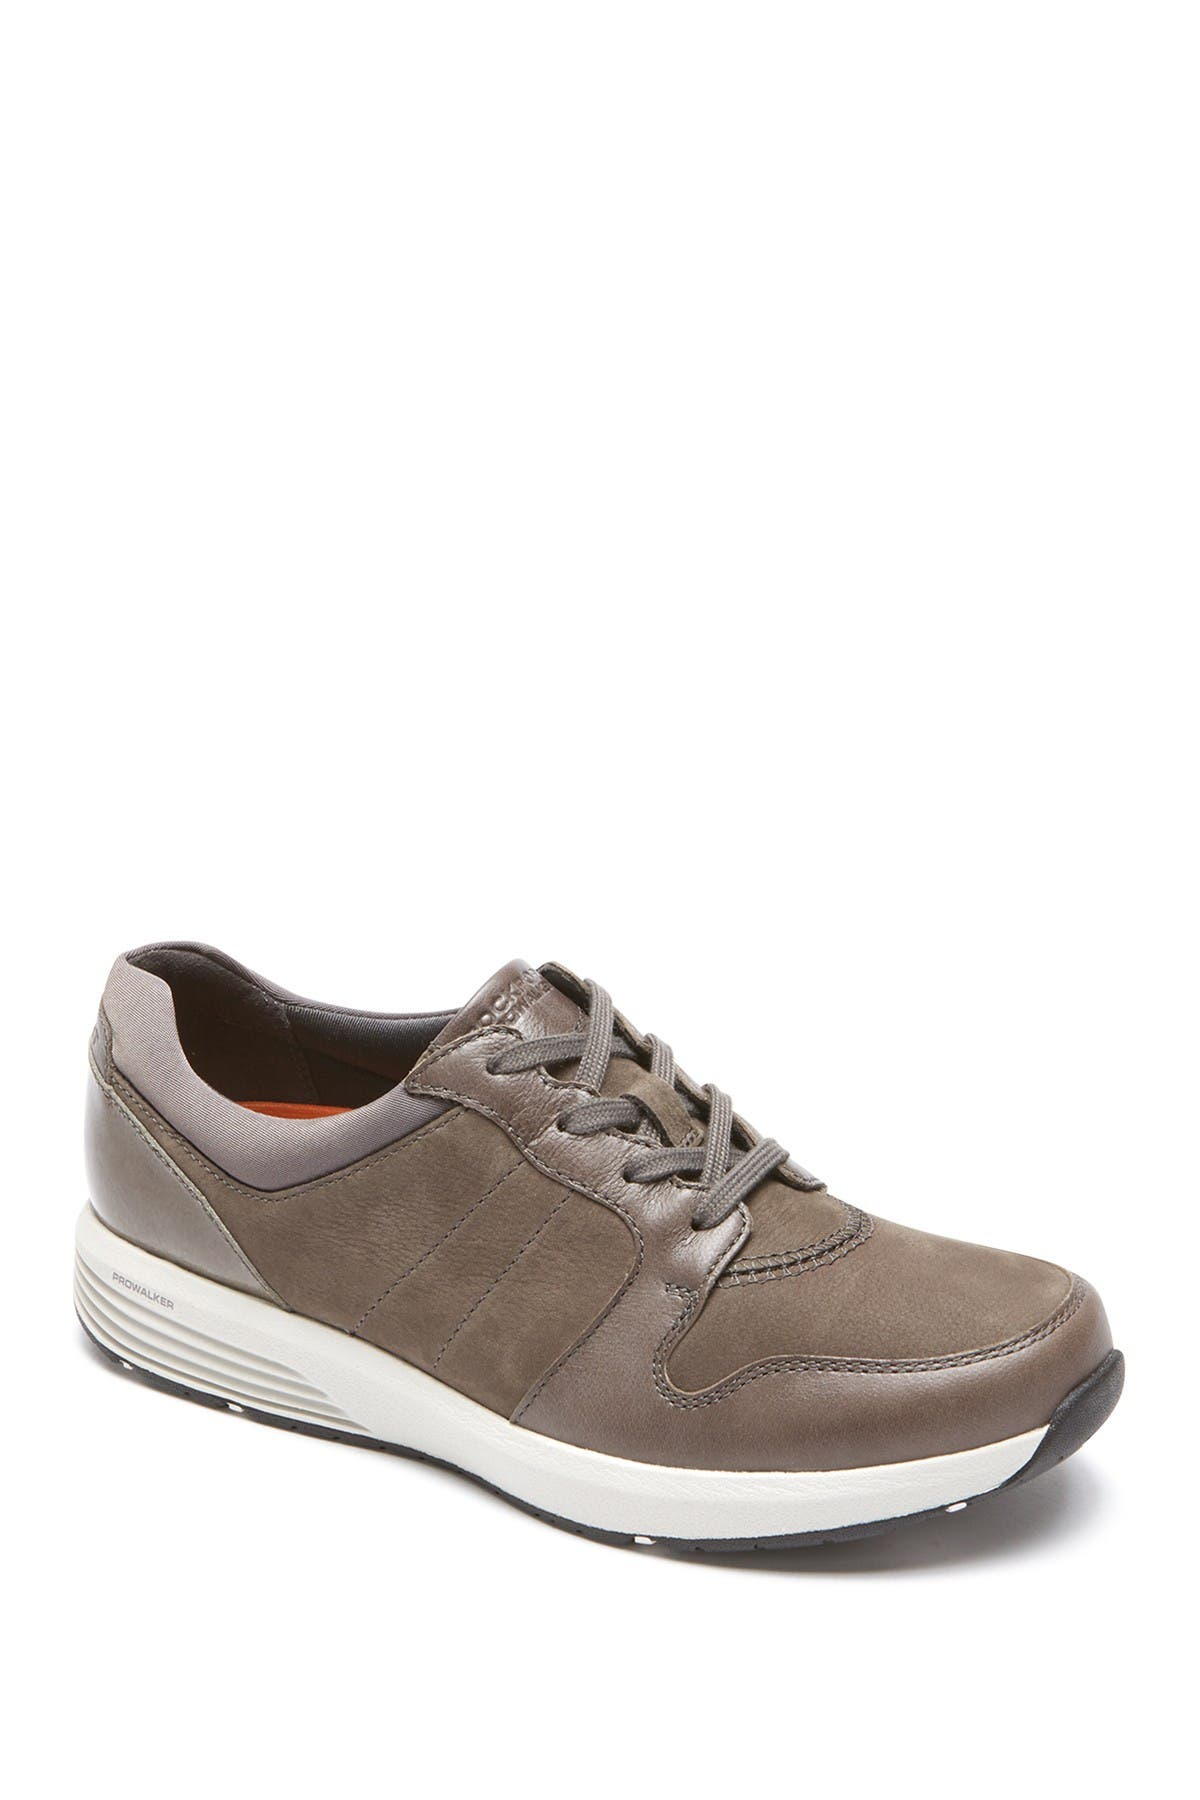 Image of Rockport Derby Trainer LTD Sneaker - Multiple Widths Available